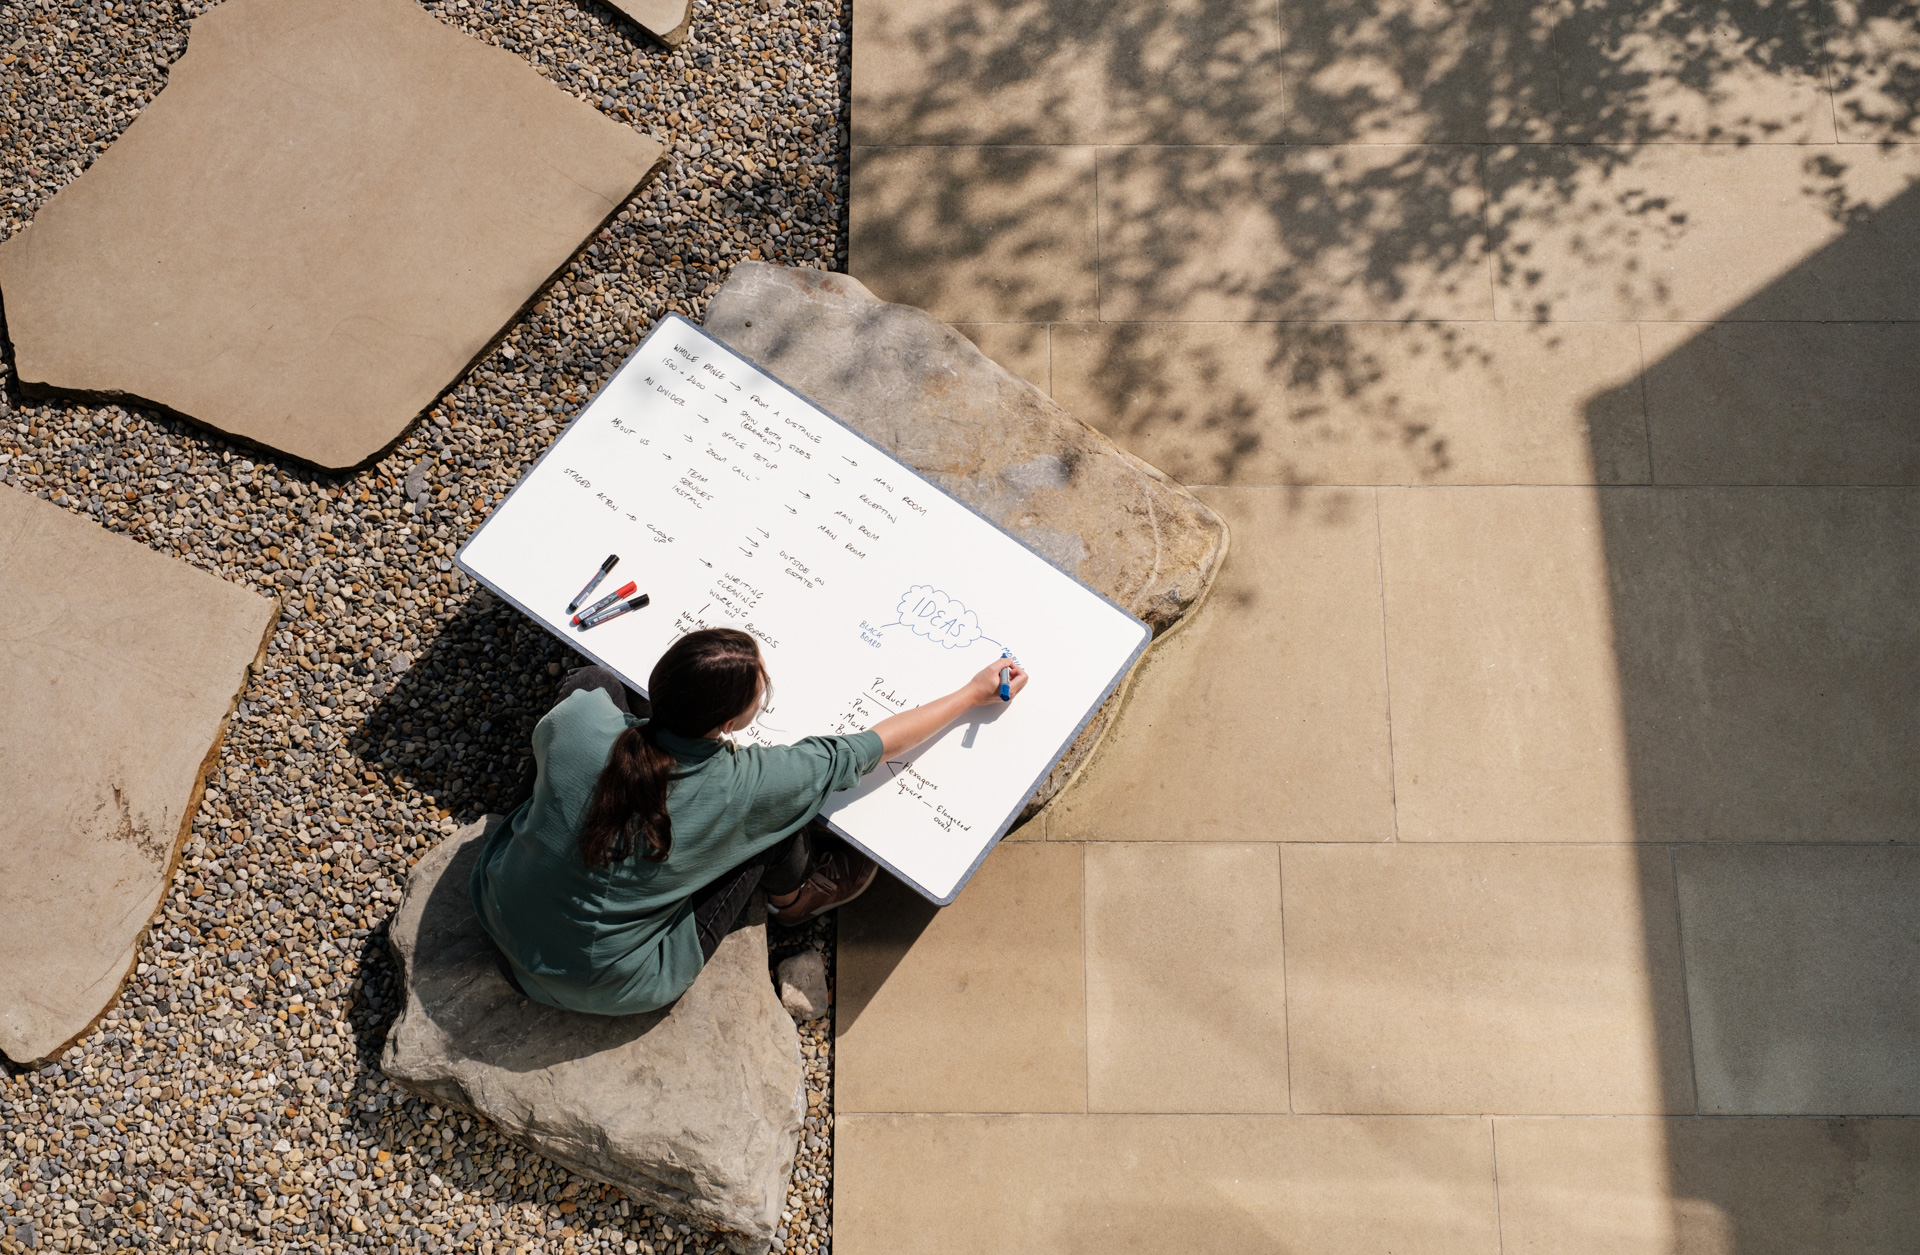 ThinkingWall Jotter portable whiteboard